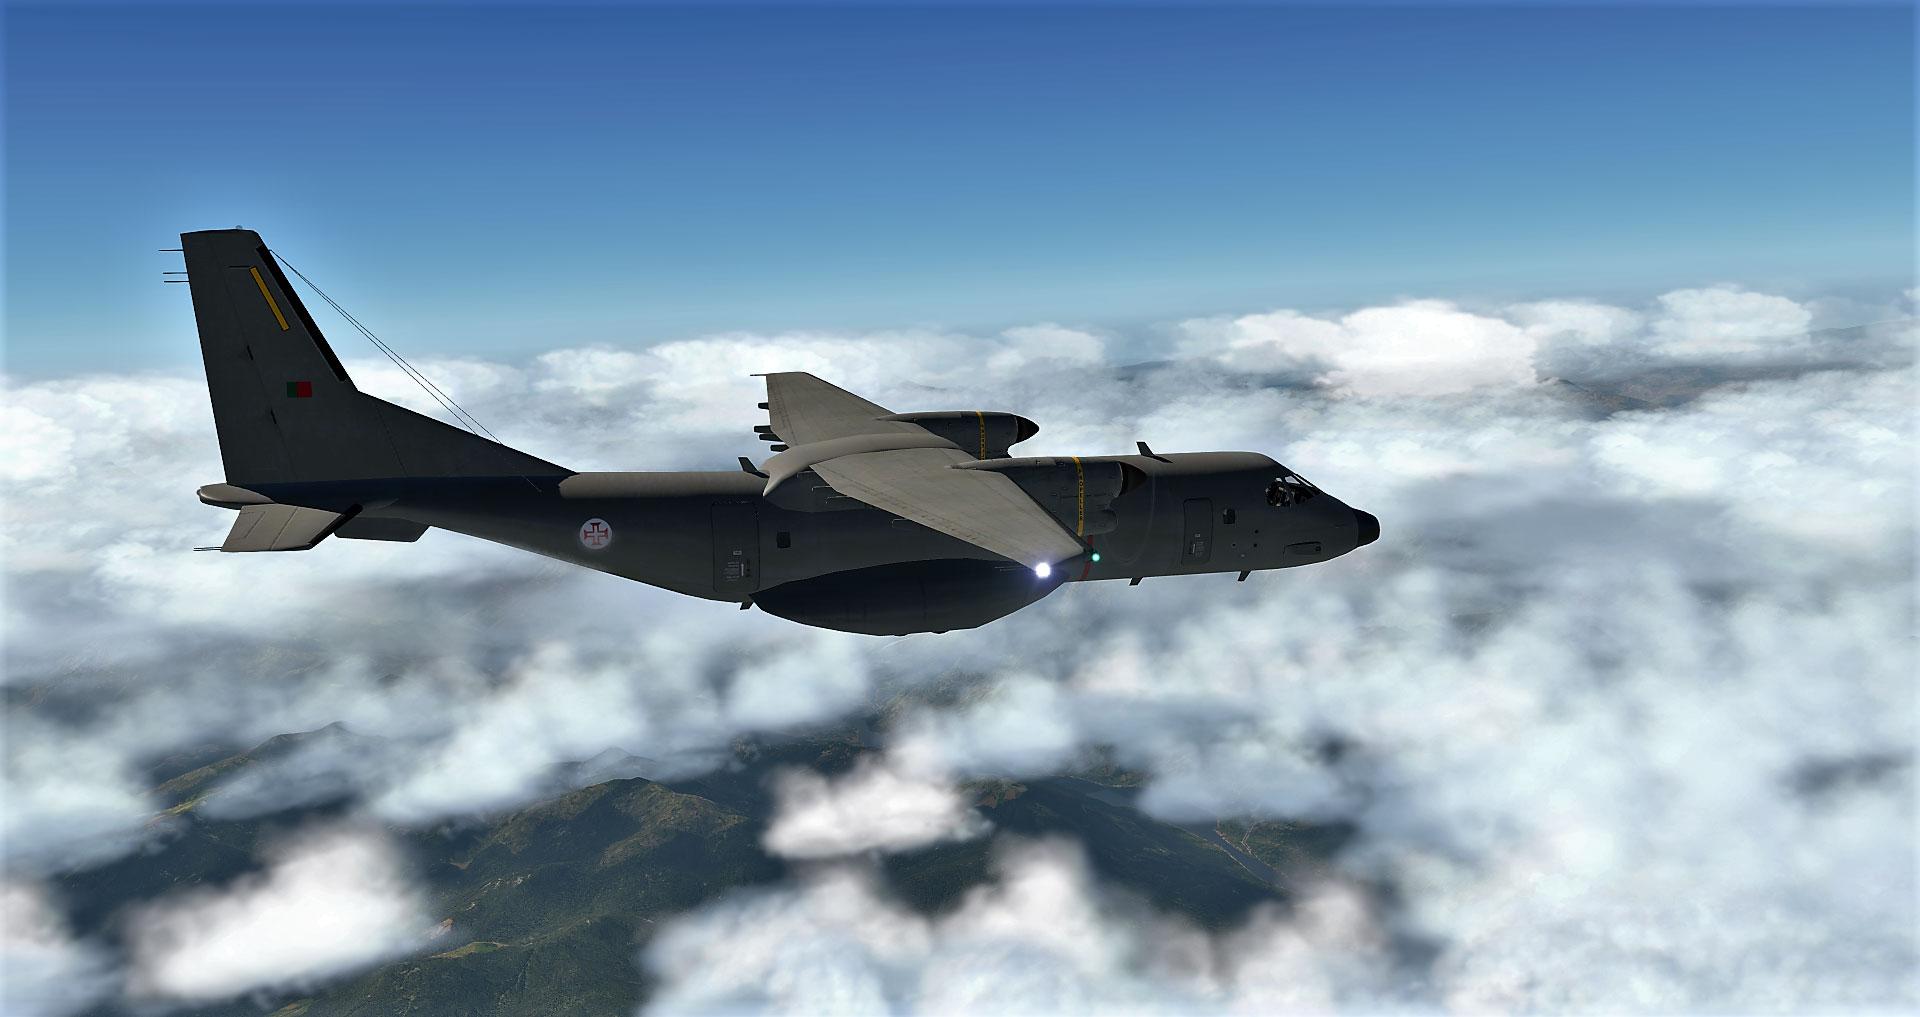 EADS295---2021-02-13-19.57